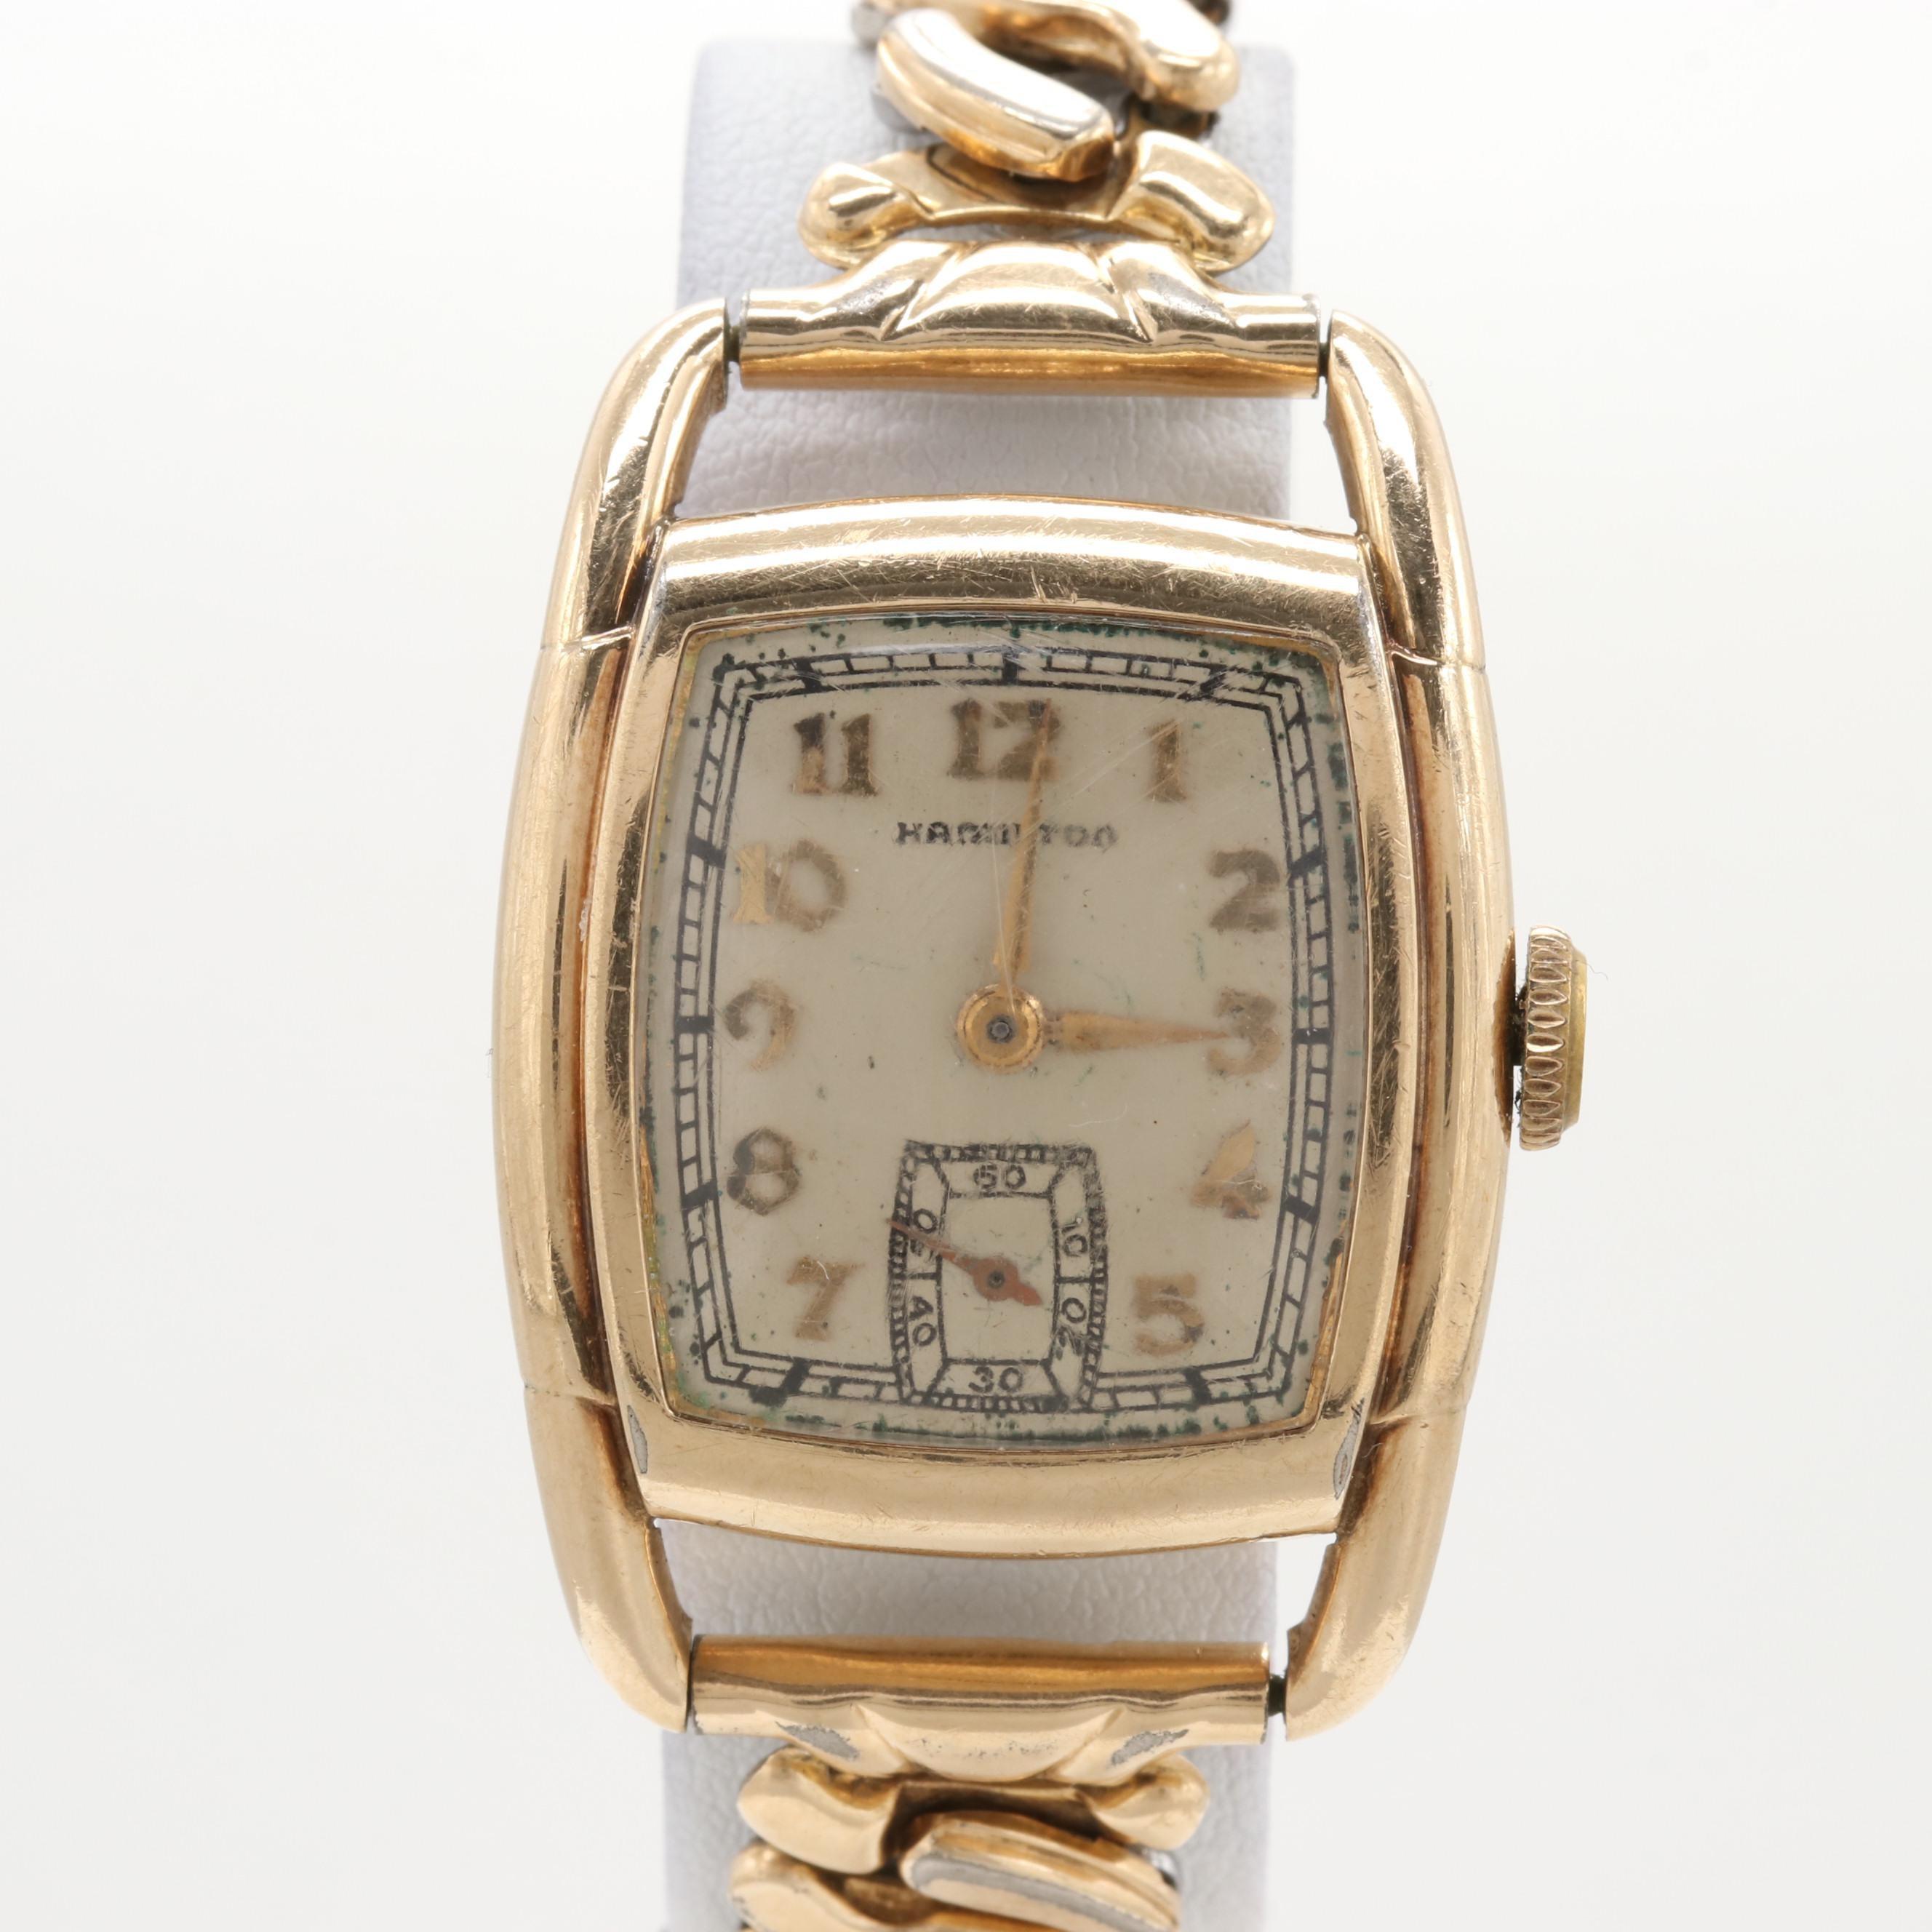 Hamilton 10K Gold Filled Stem Wind Wristwatch, Circa 1938